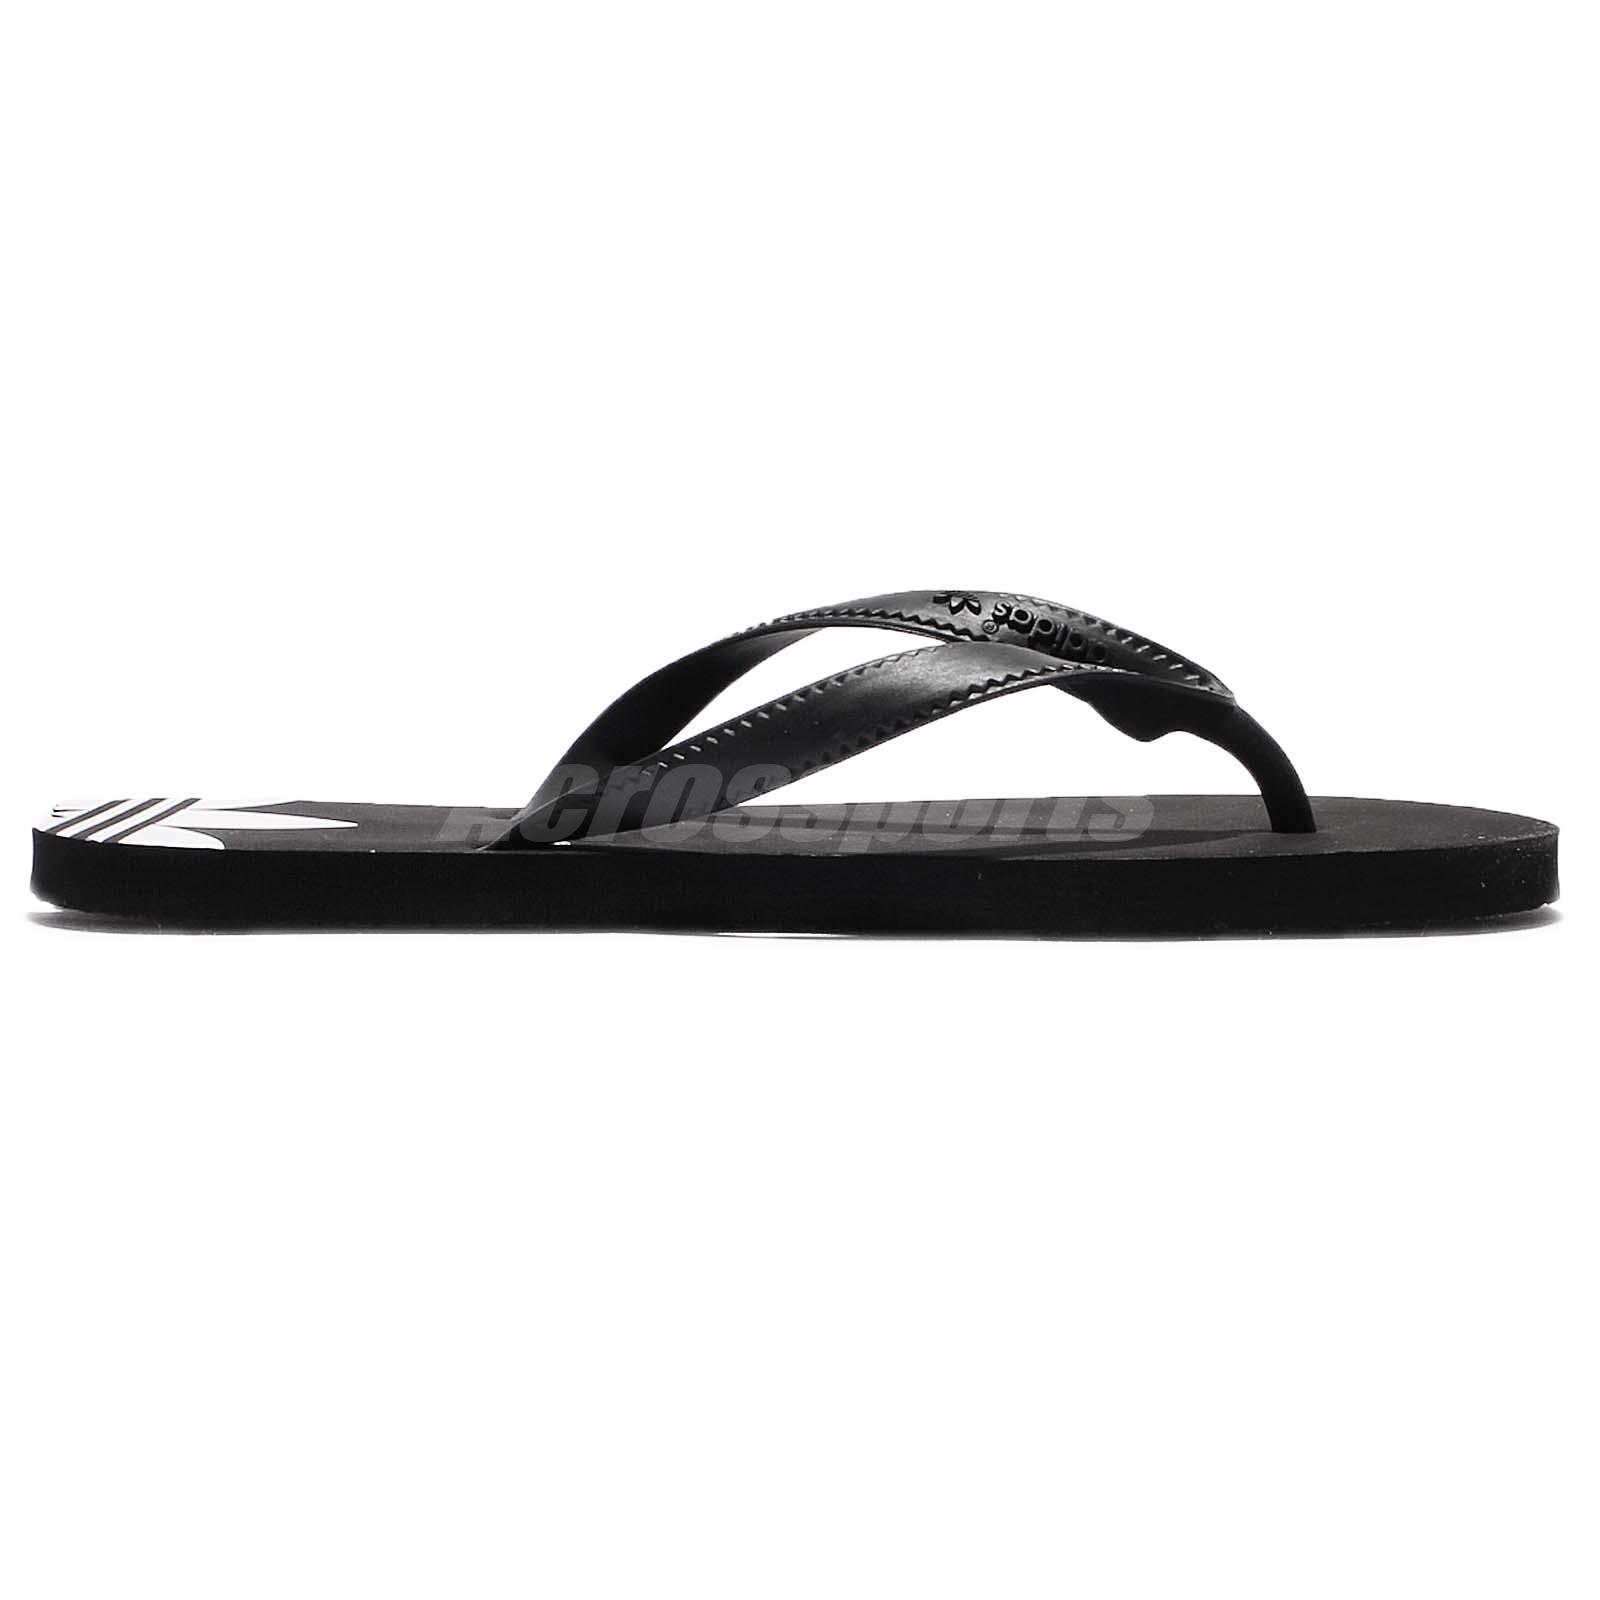 e35e99e77 adidas Originals ADI Sun W Black White Women Thong Flip-Flop Sandal ...